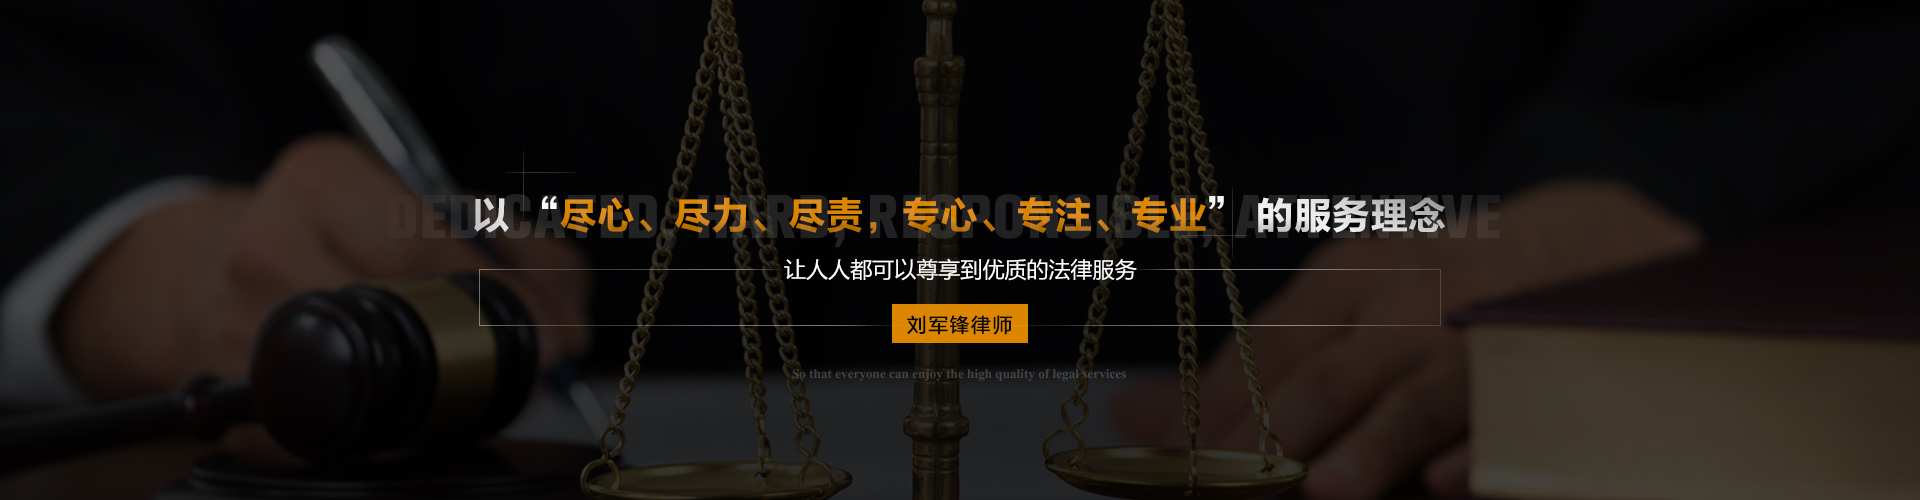 刘军锋律师